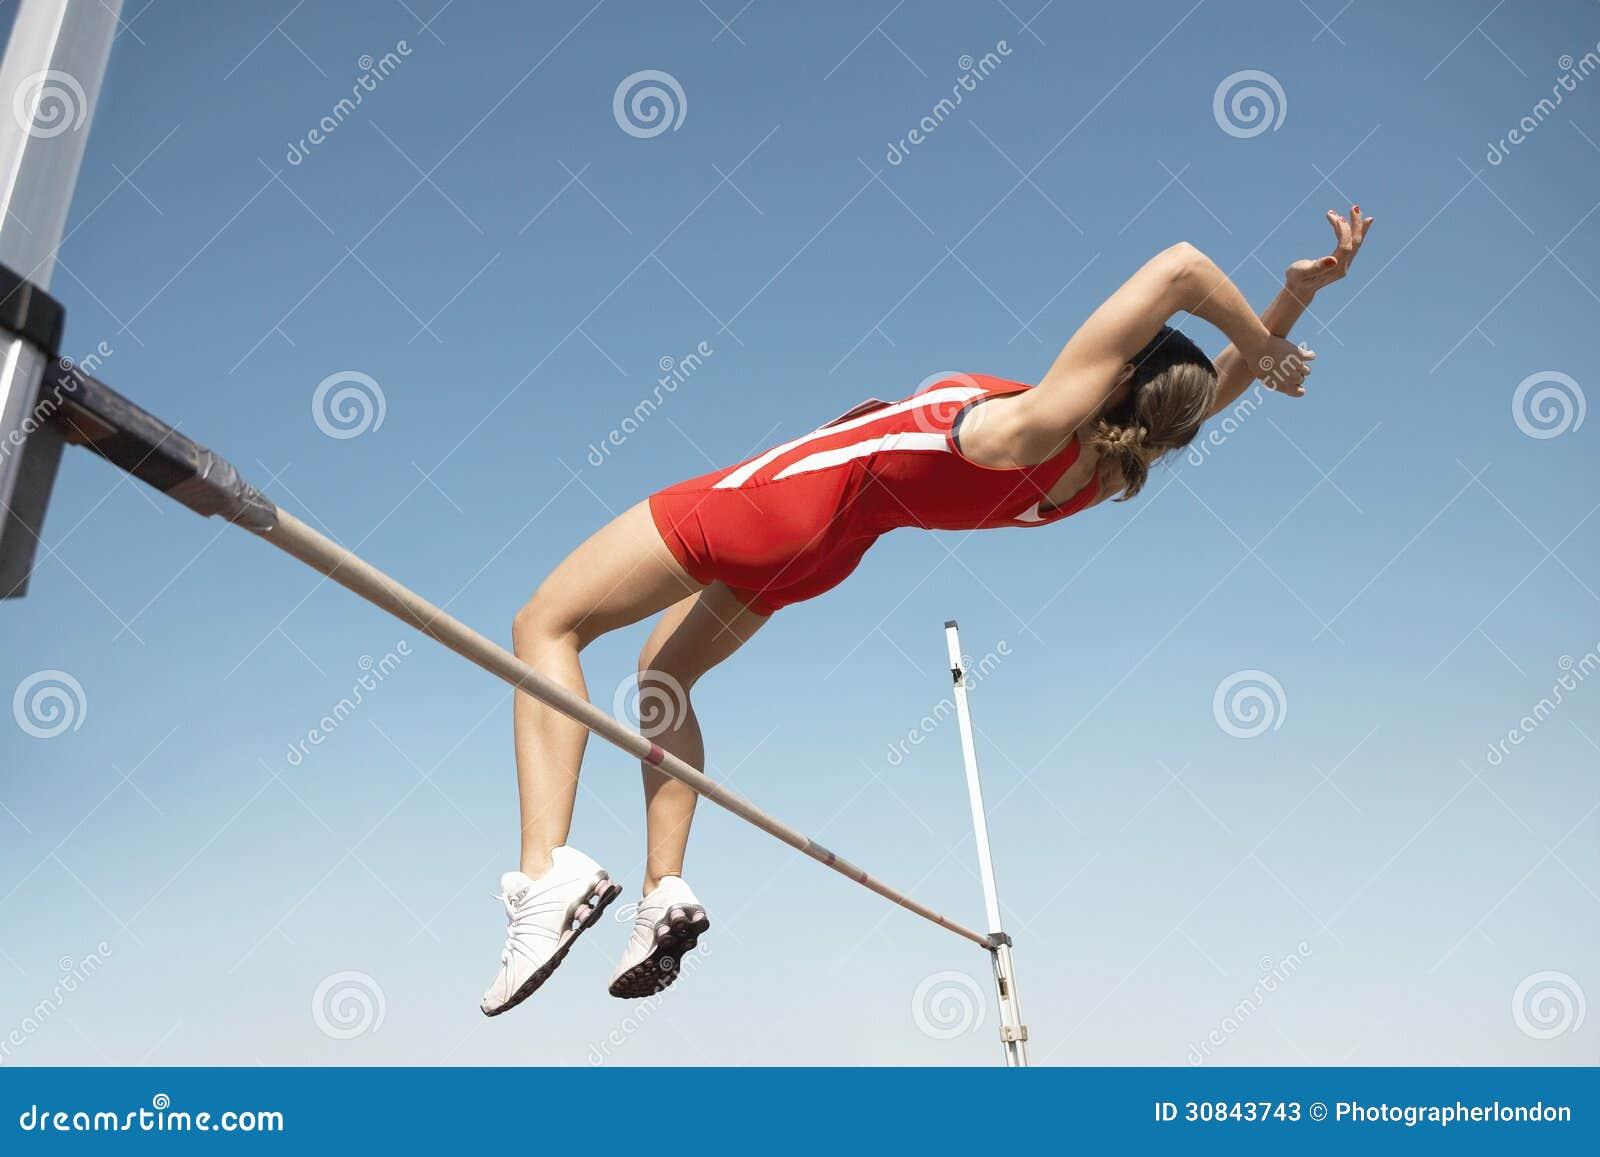 Jumper In Midair Over Bar alto